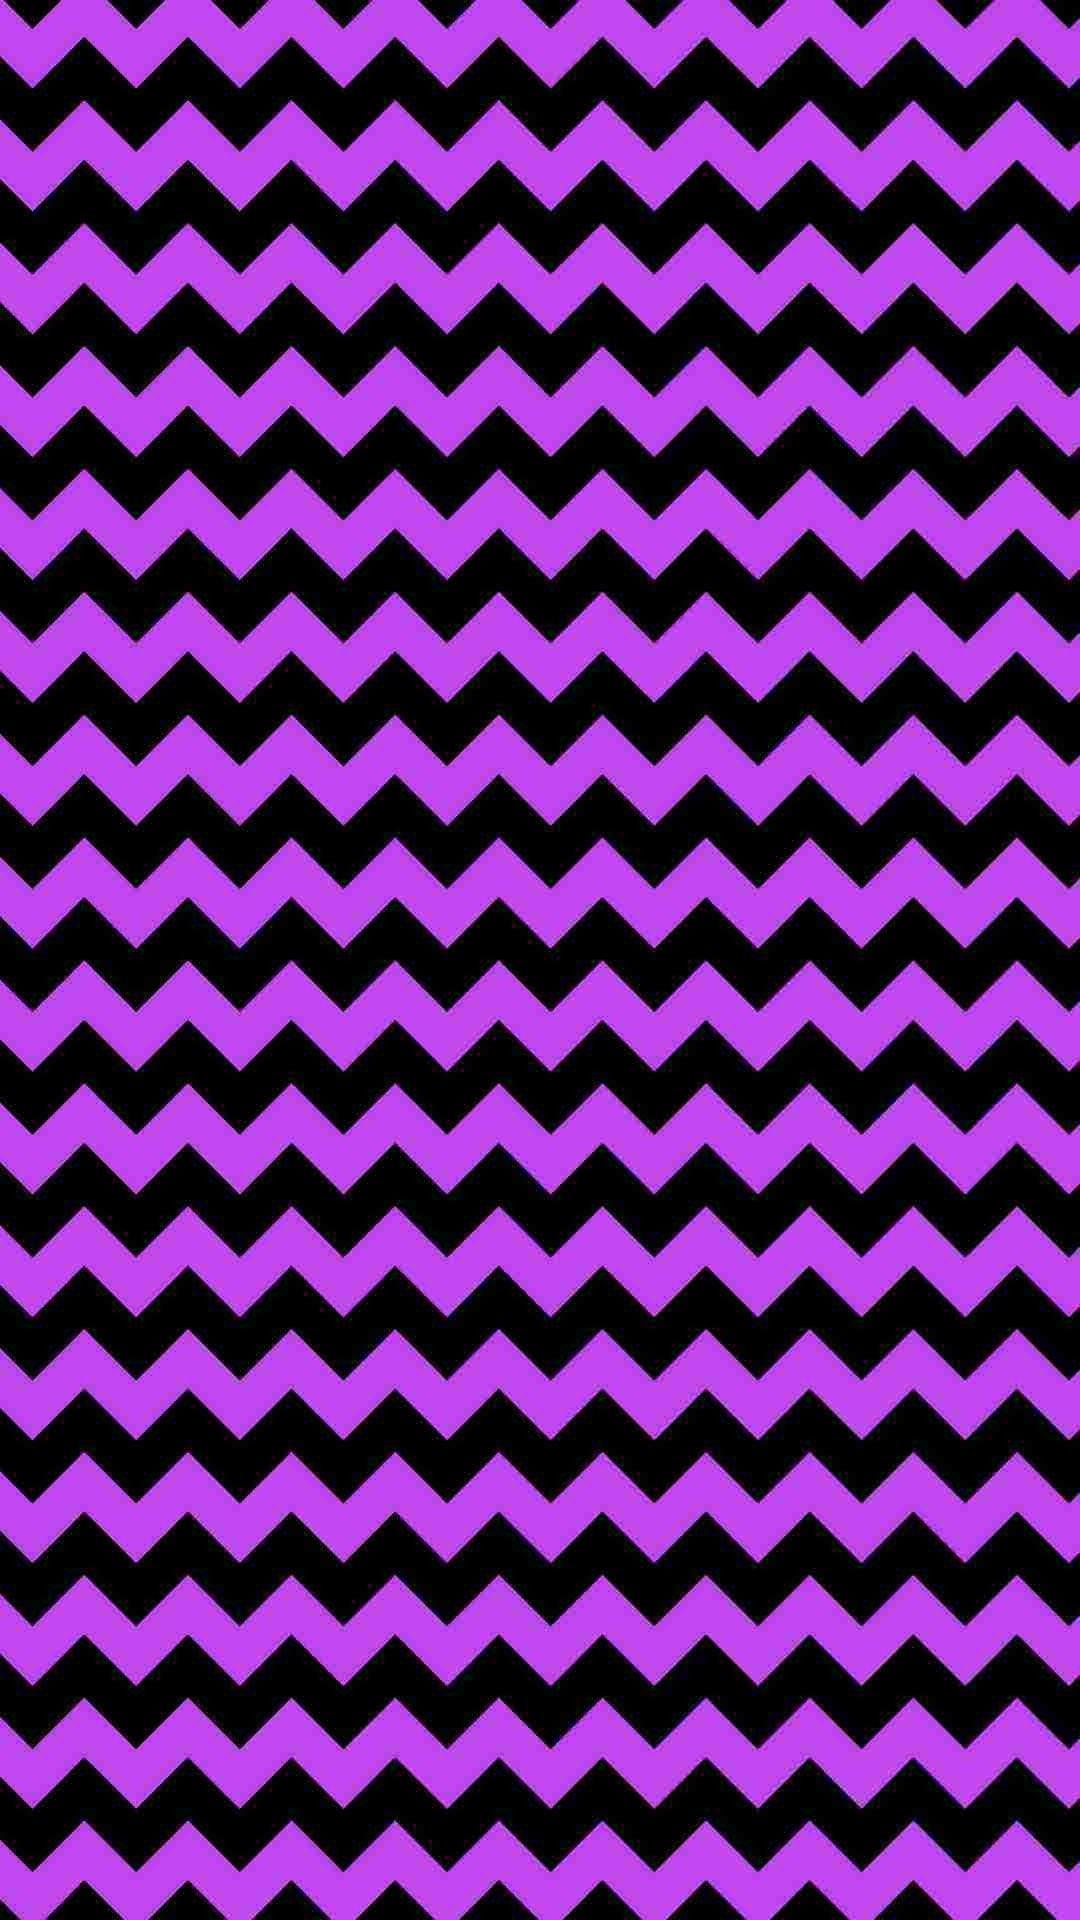 Purple and Black Chevron iPhone 6 Plus Wallpaper - Glitter Ze Print ...